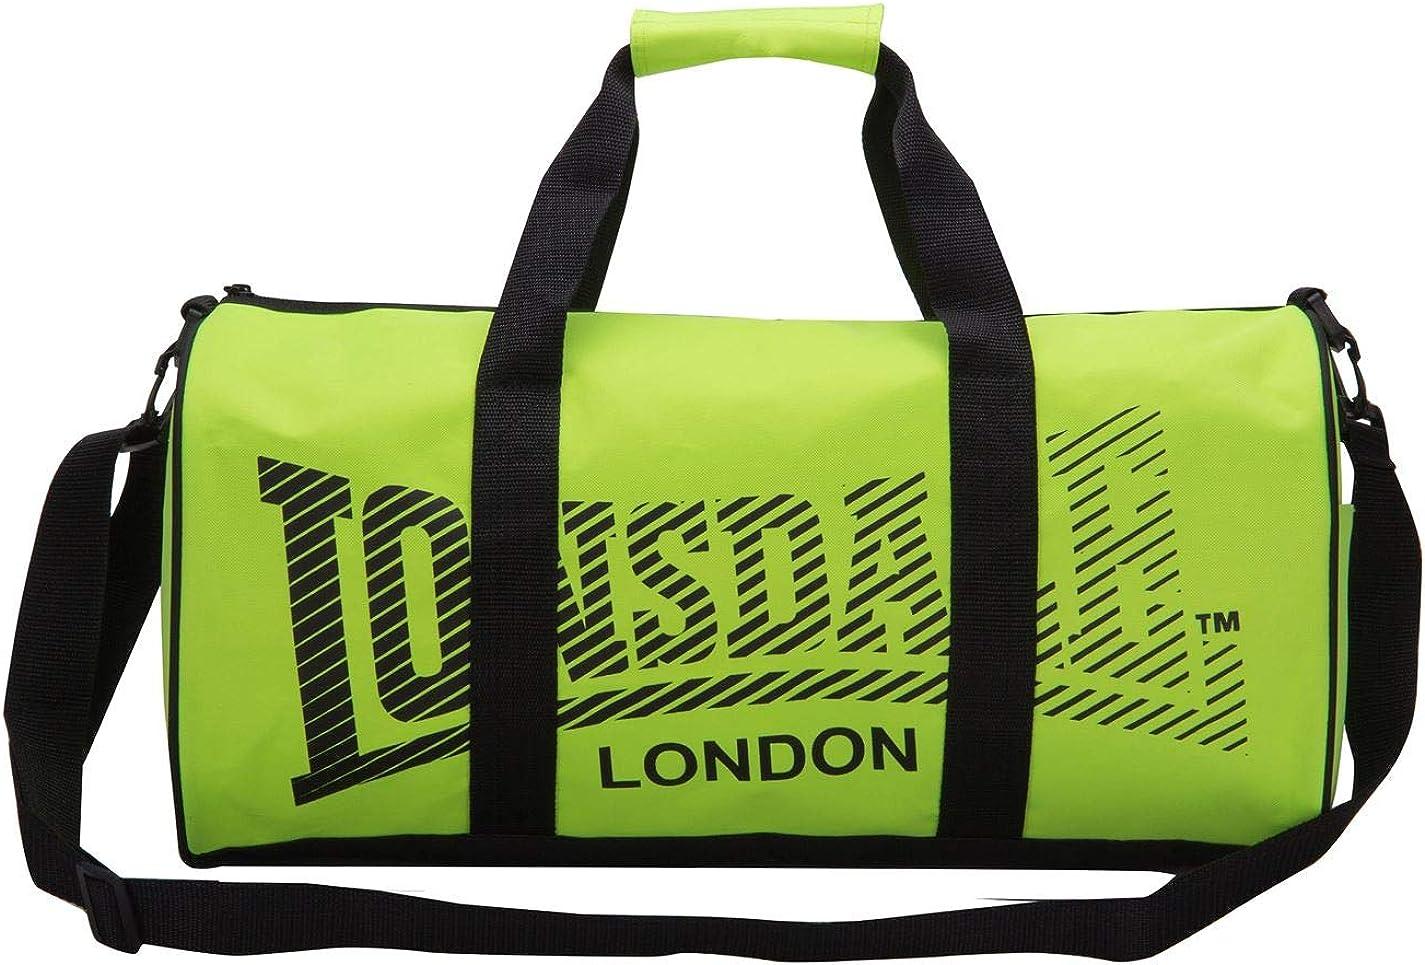 Lonsdale Barrel Bag Gym Fitness Sac fourre-tout